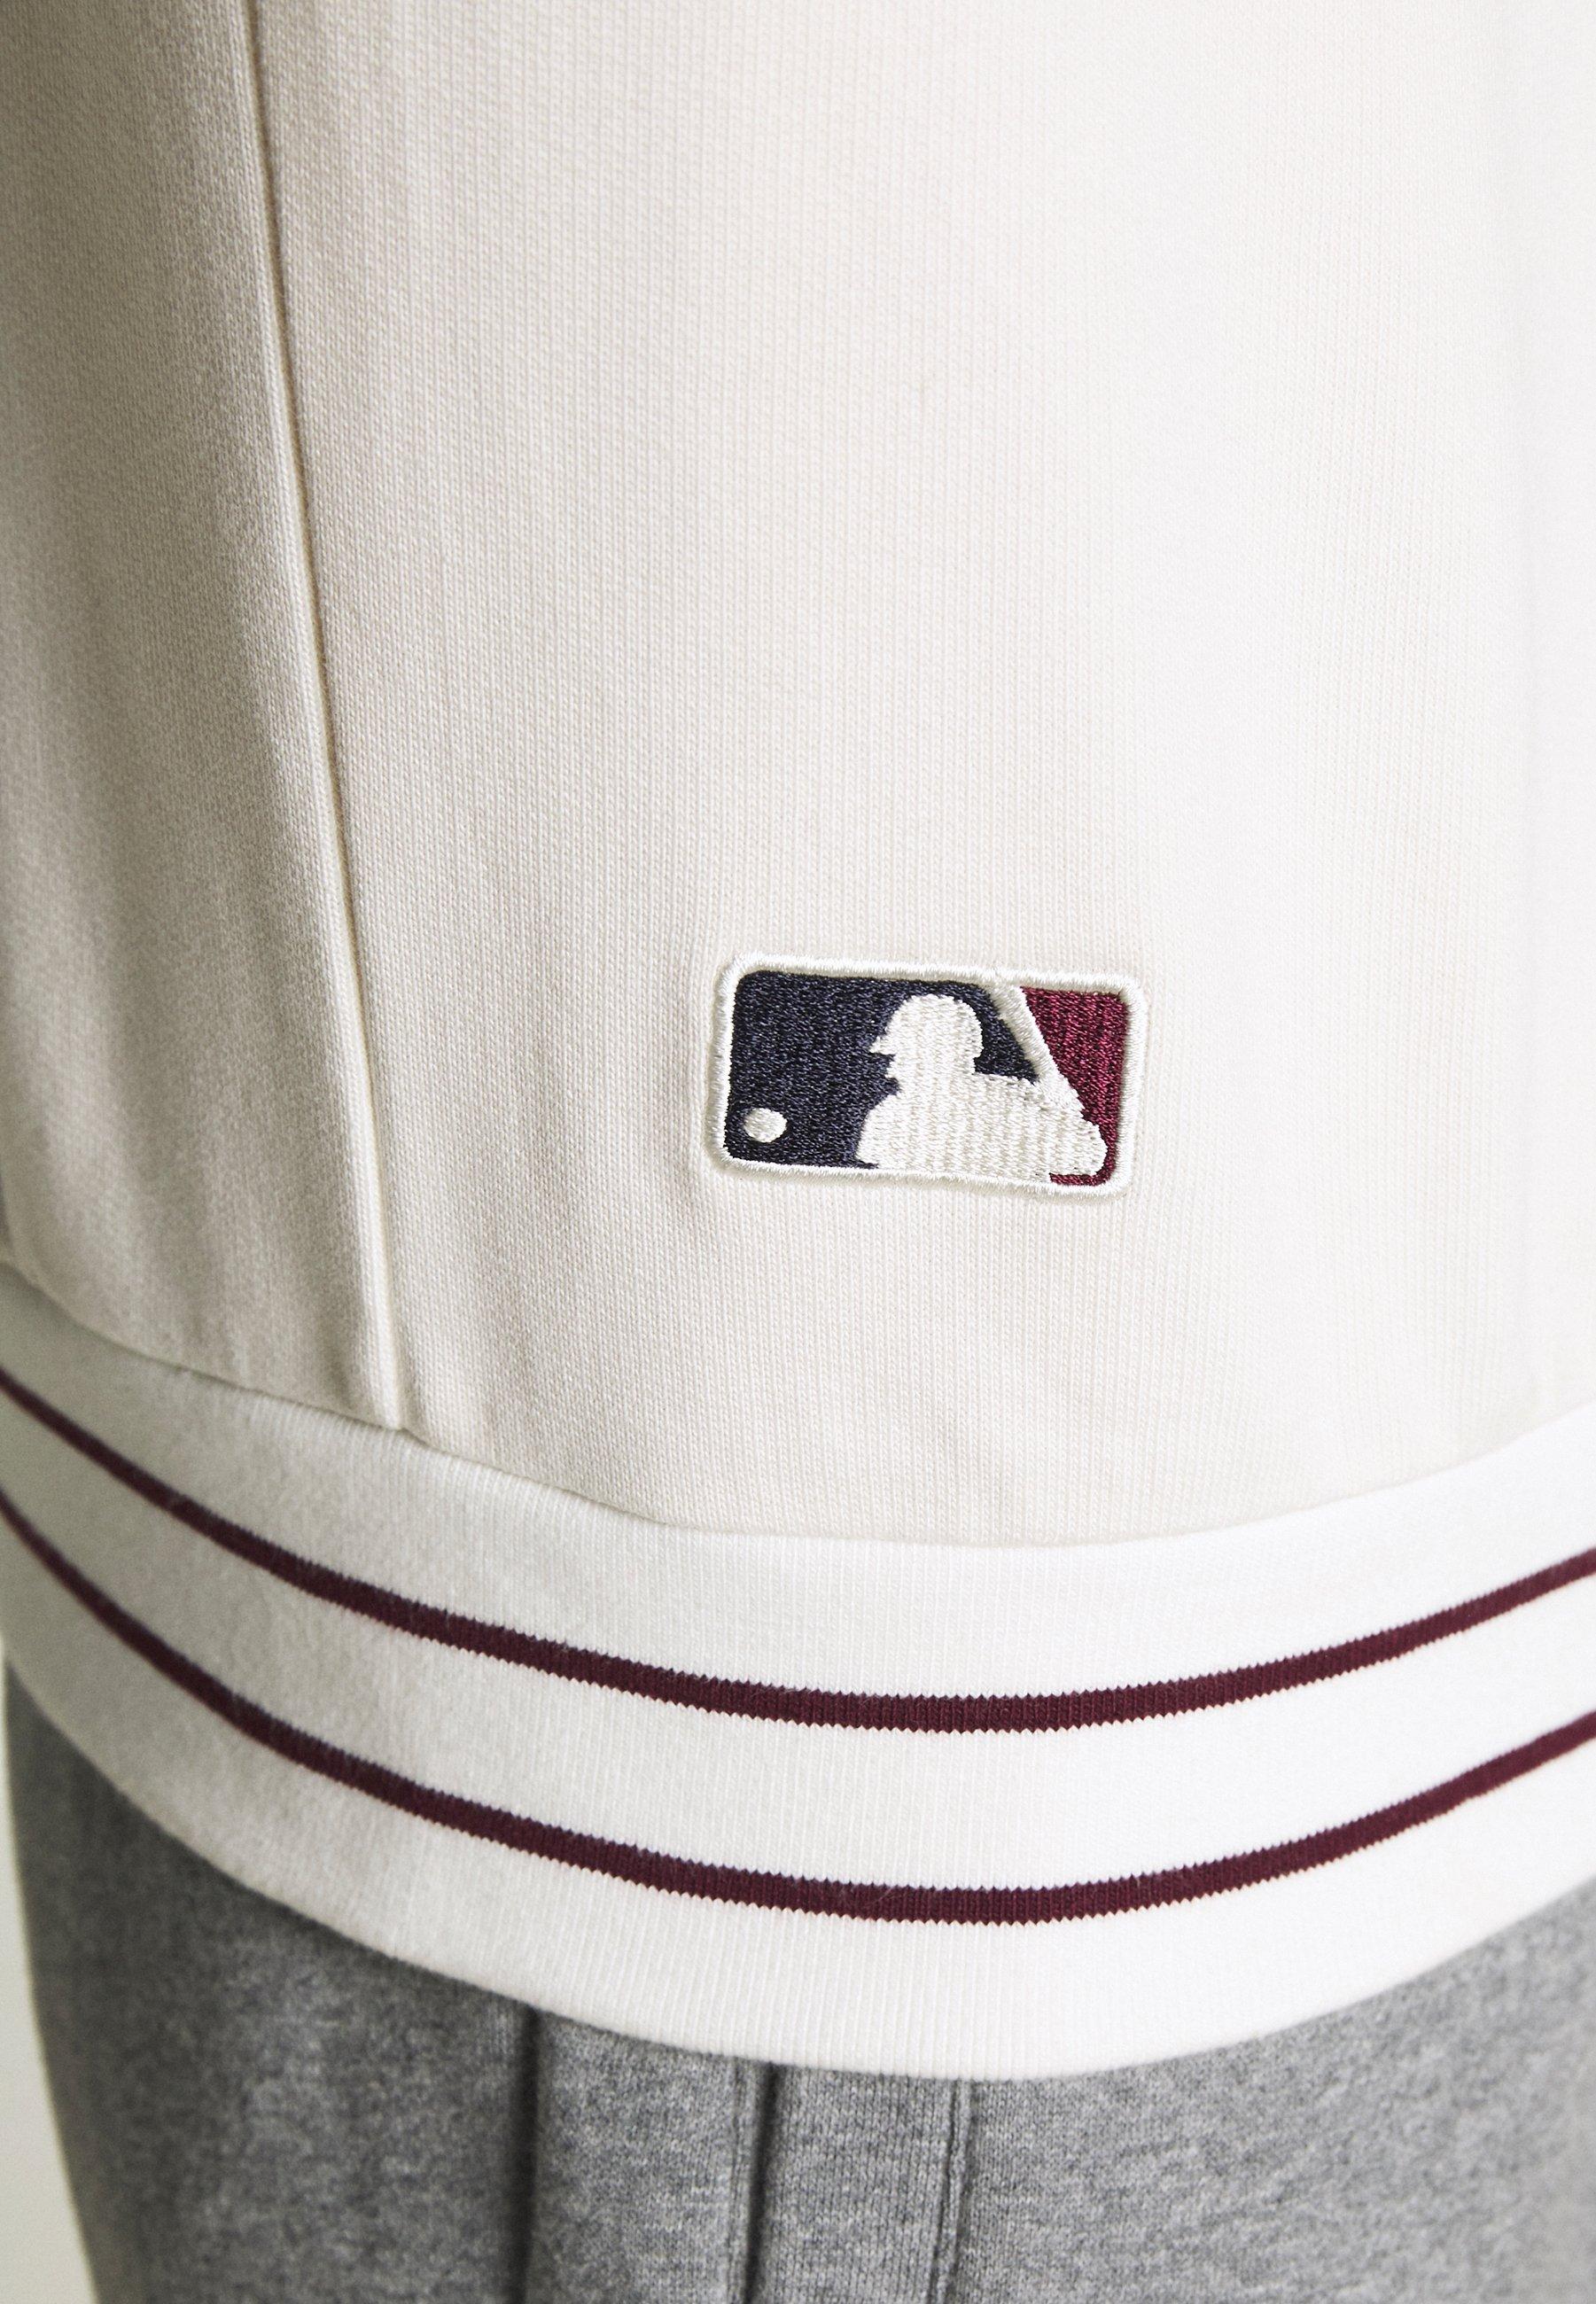 Kustannus Miesten vaatteet Sarja dfKJIUp97454sfGHYHD New Era MLB HERITAGE SCRIPT CREW BOSTON RED SOX Collegepaita beige